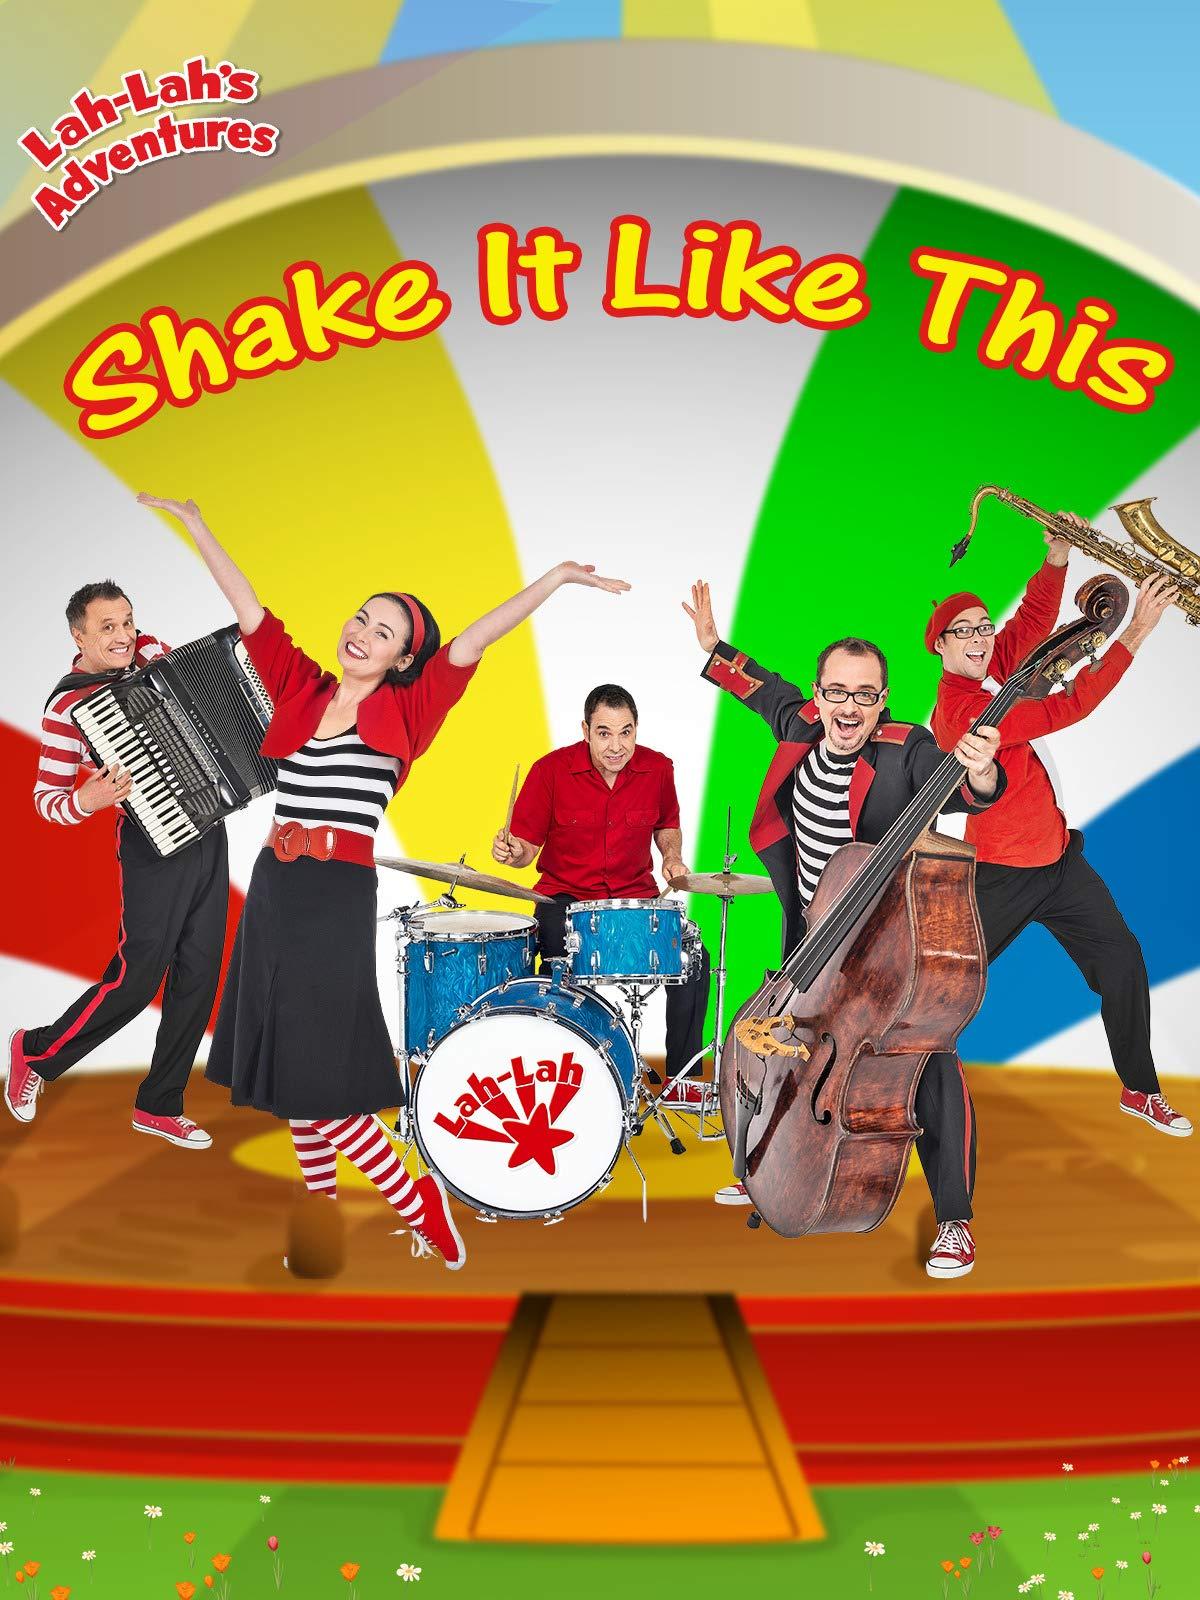 Shake It Like This